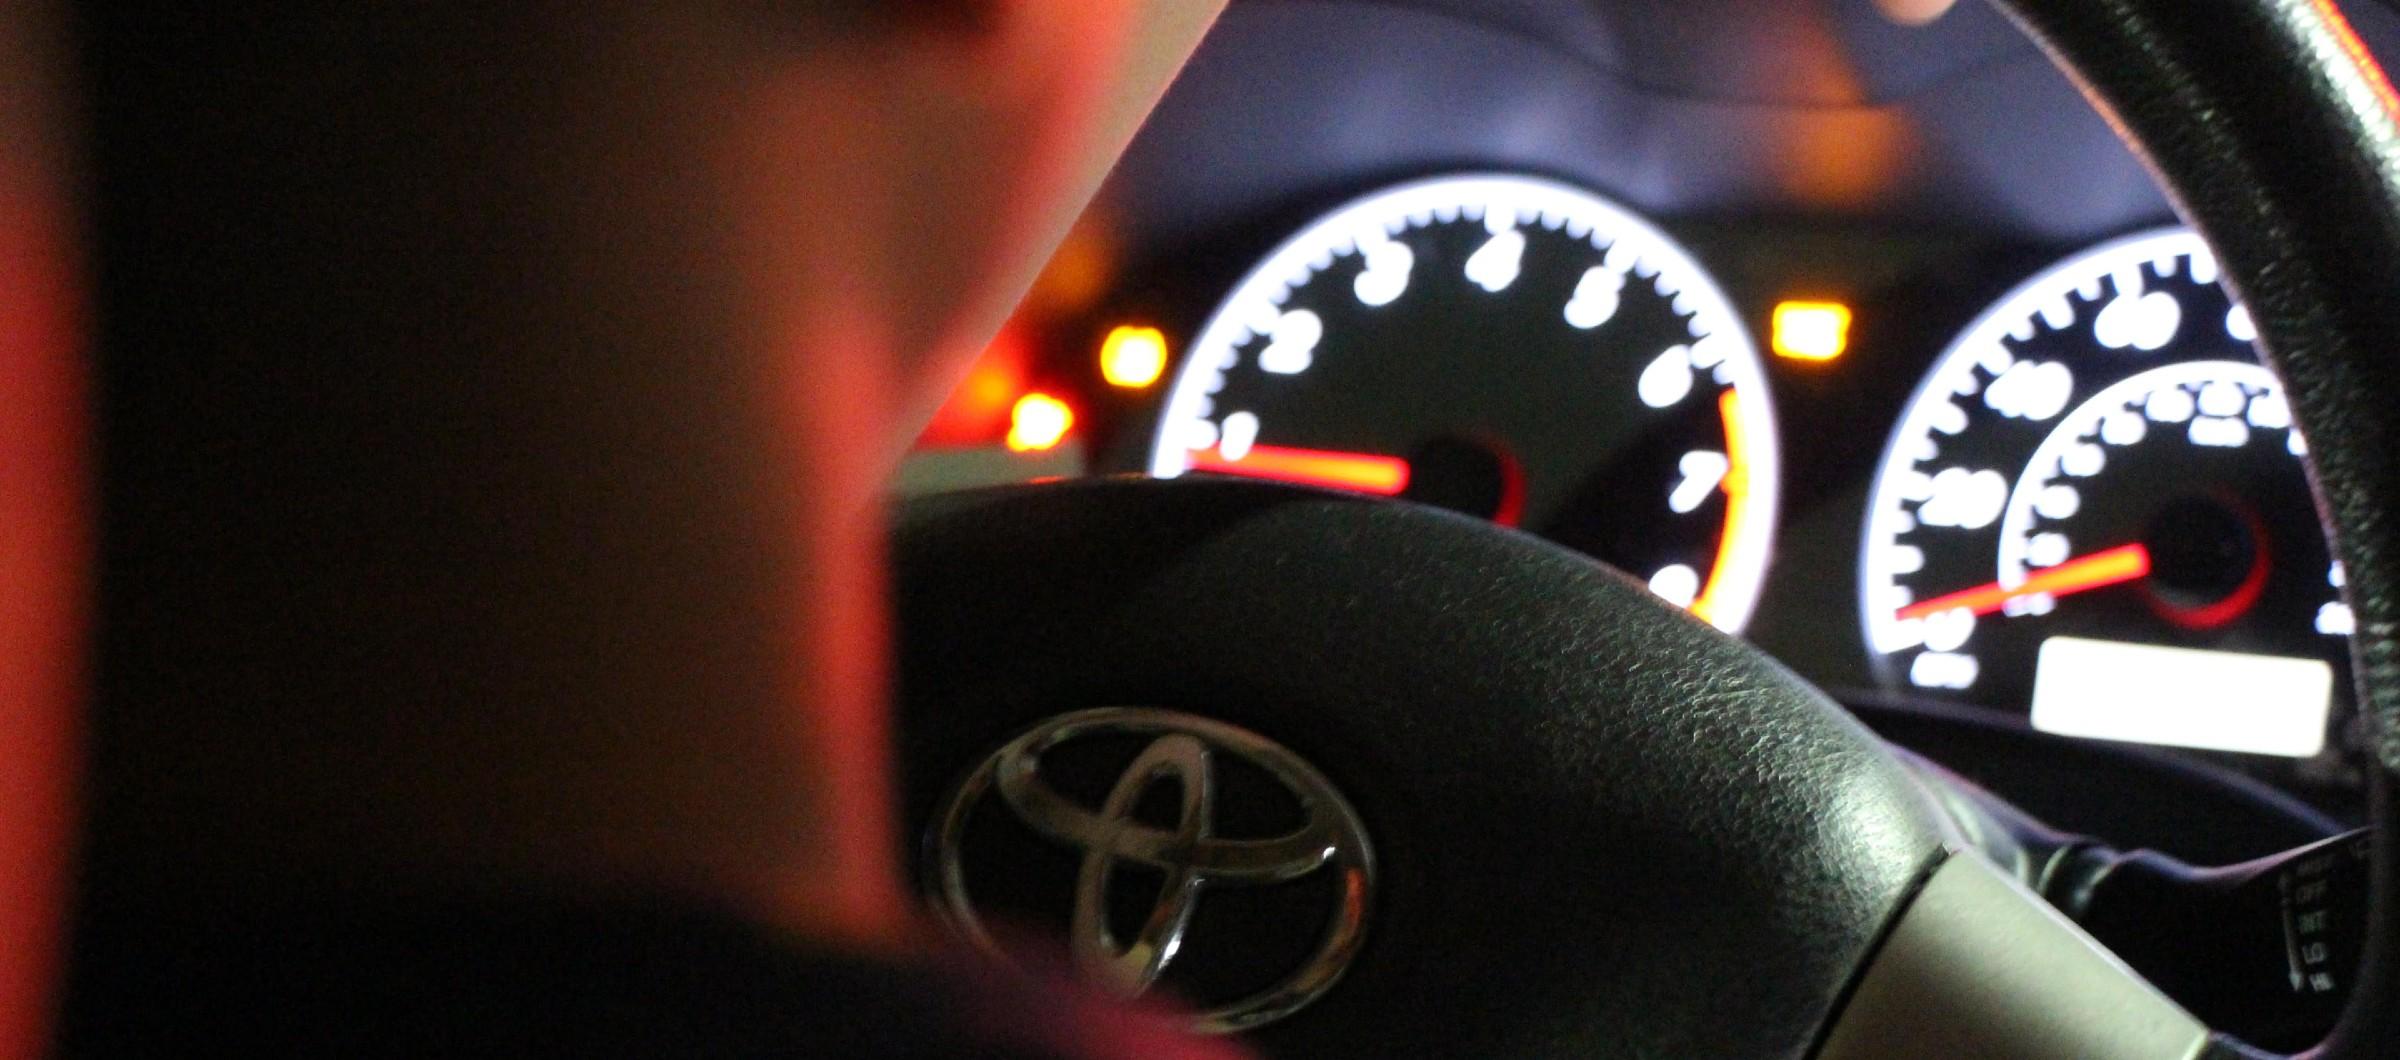 Car line speedometer